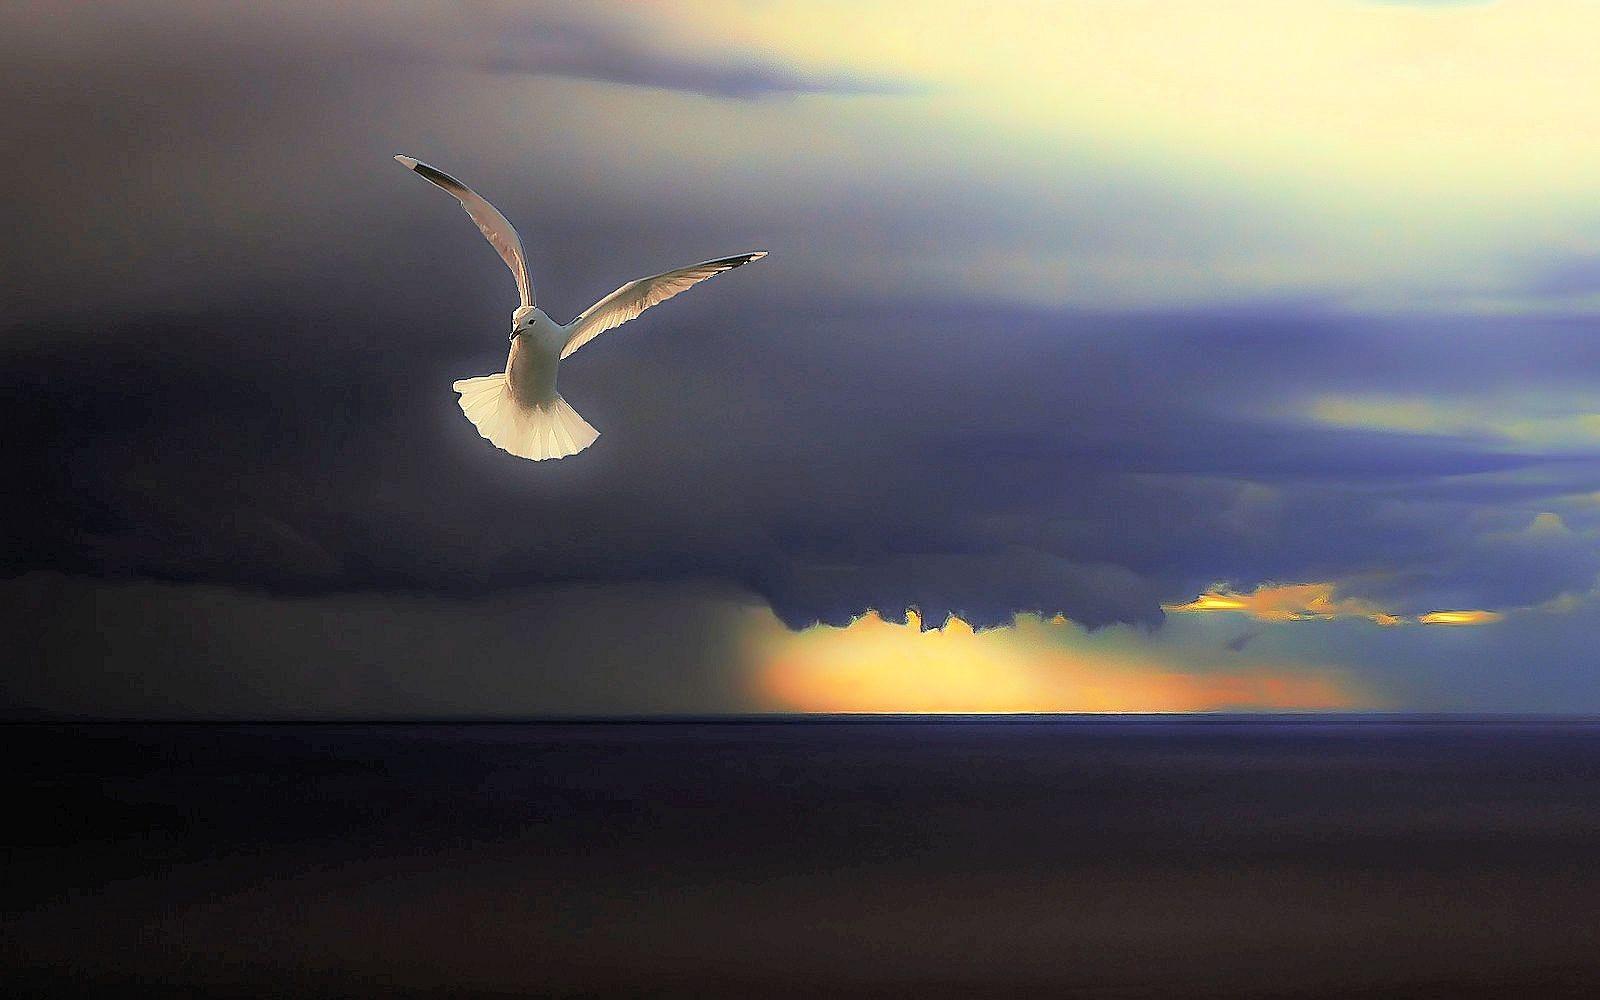 Apple iMac 215   Hope Beautiful Sunset Sky Clouds Seagull Bird 1600x1000